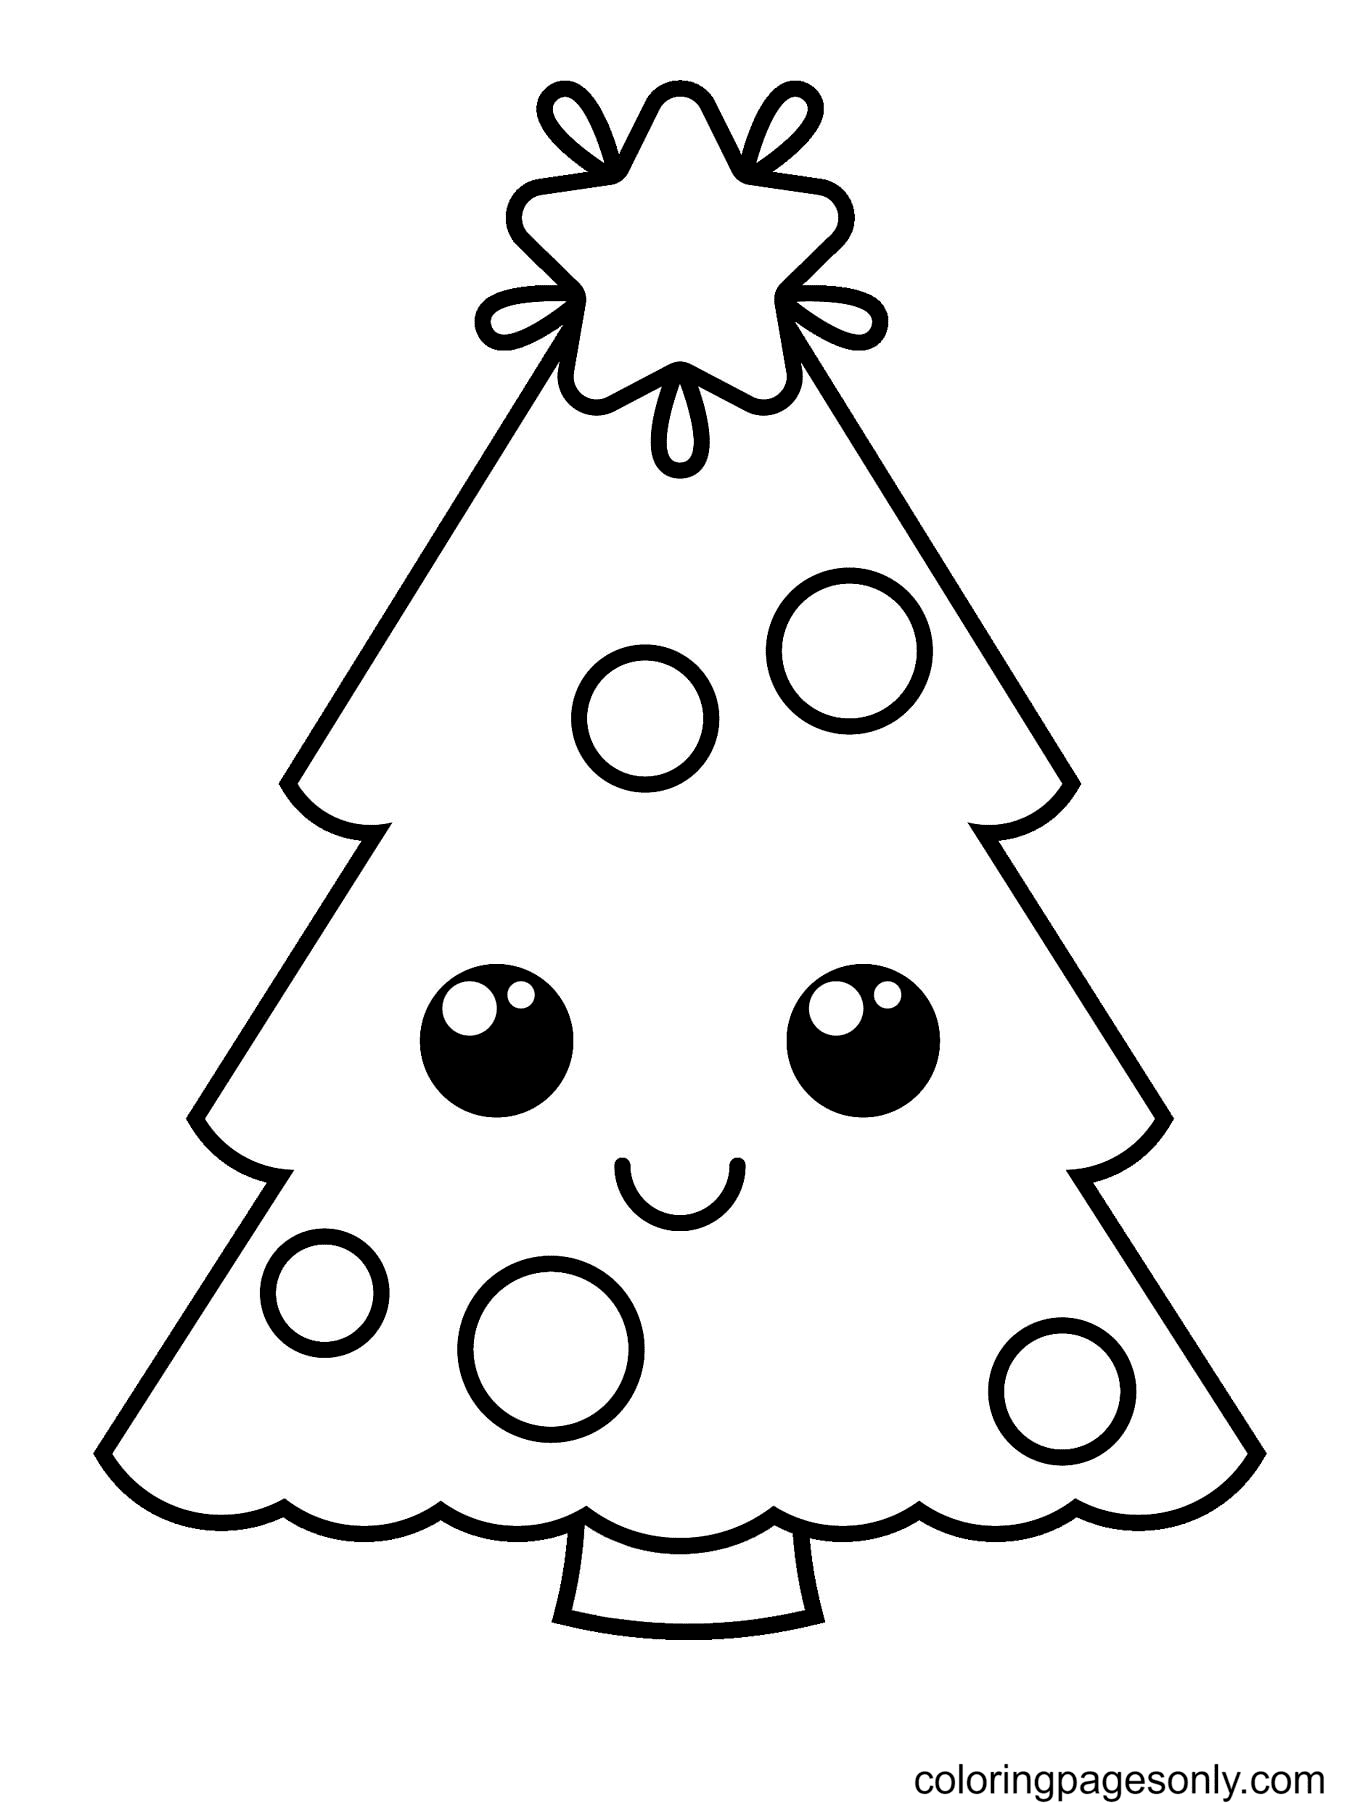 Cute Kawaii Style Christmas Tree Coloring Page